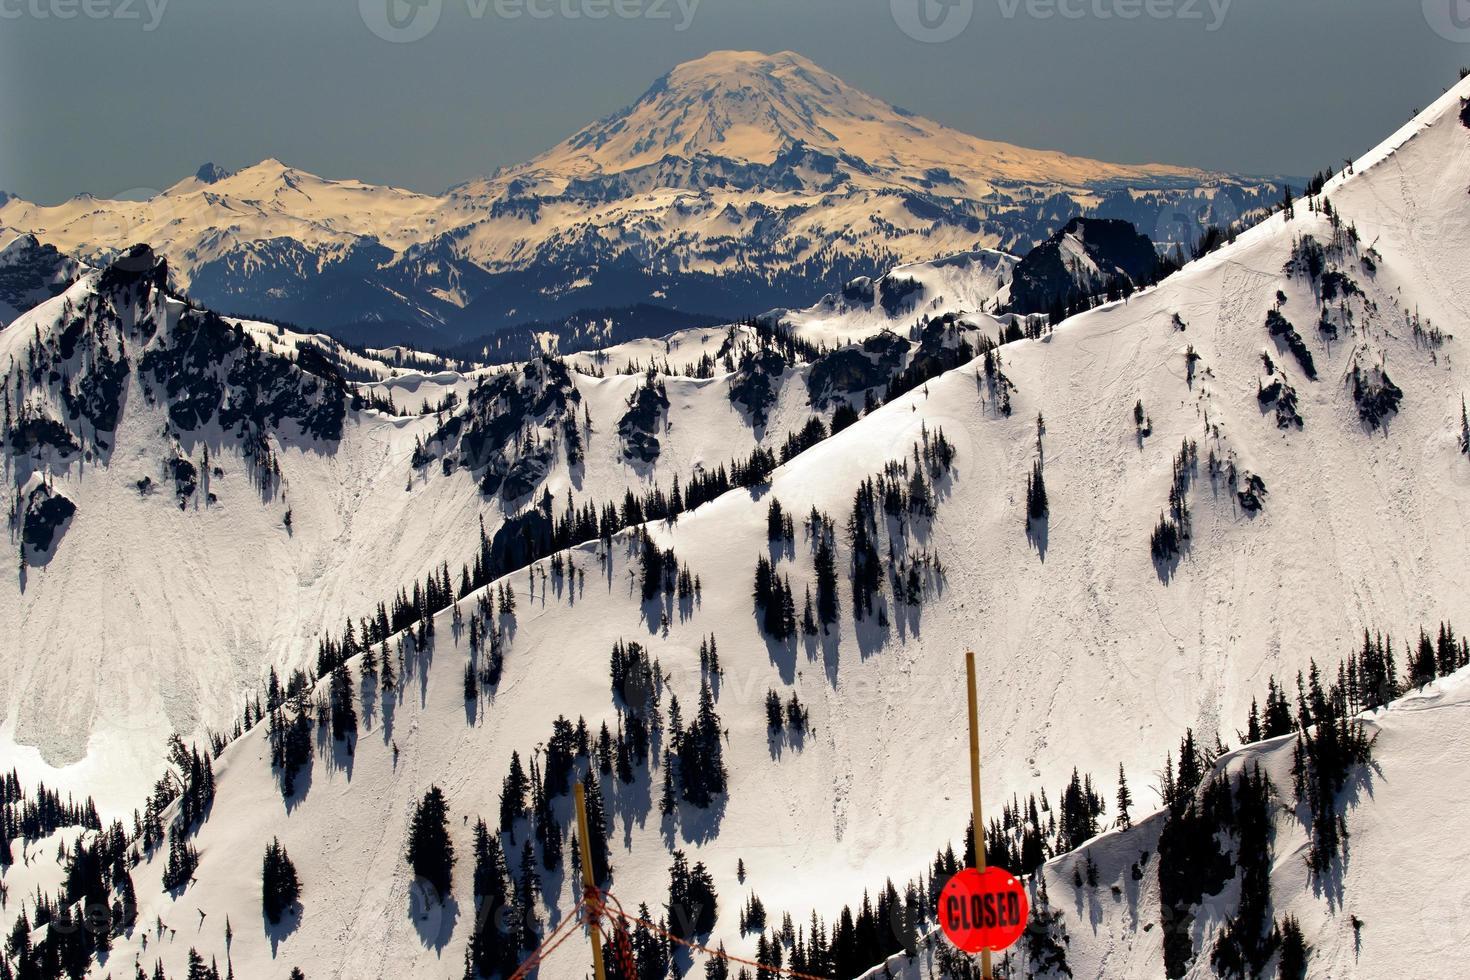 volta país nevado montagem adams washington foto